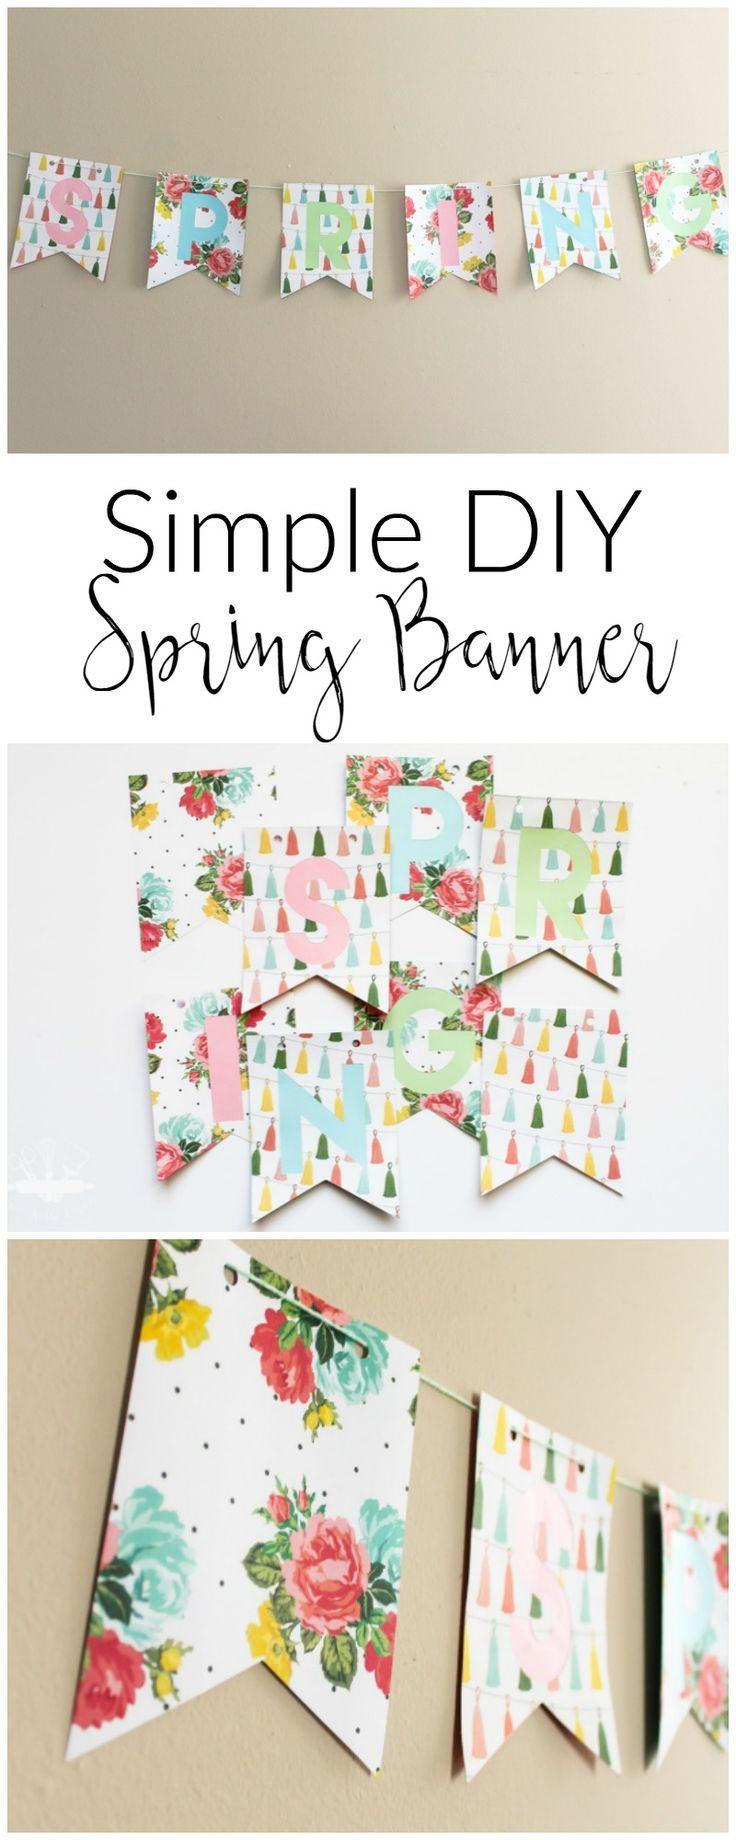 Simple DIY Spring Banner | Pinterest